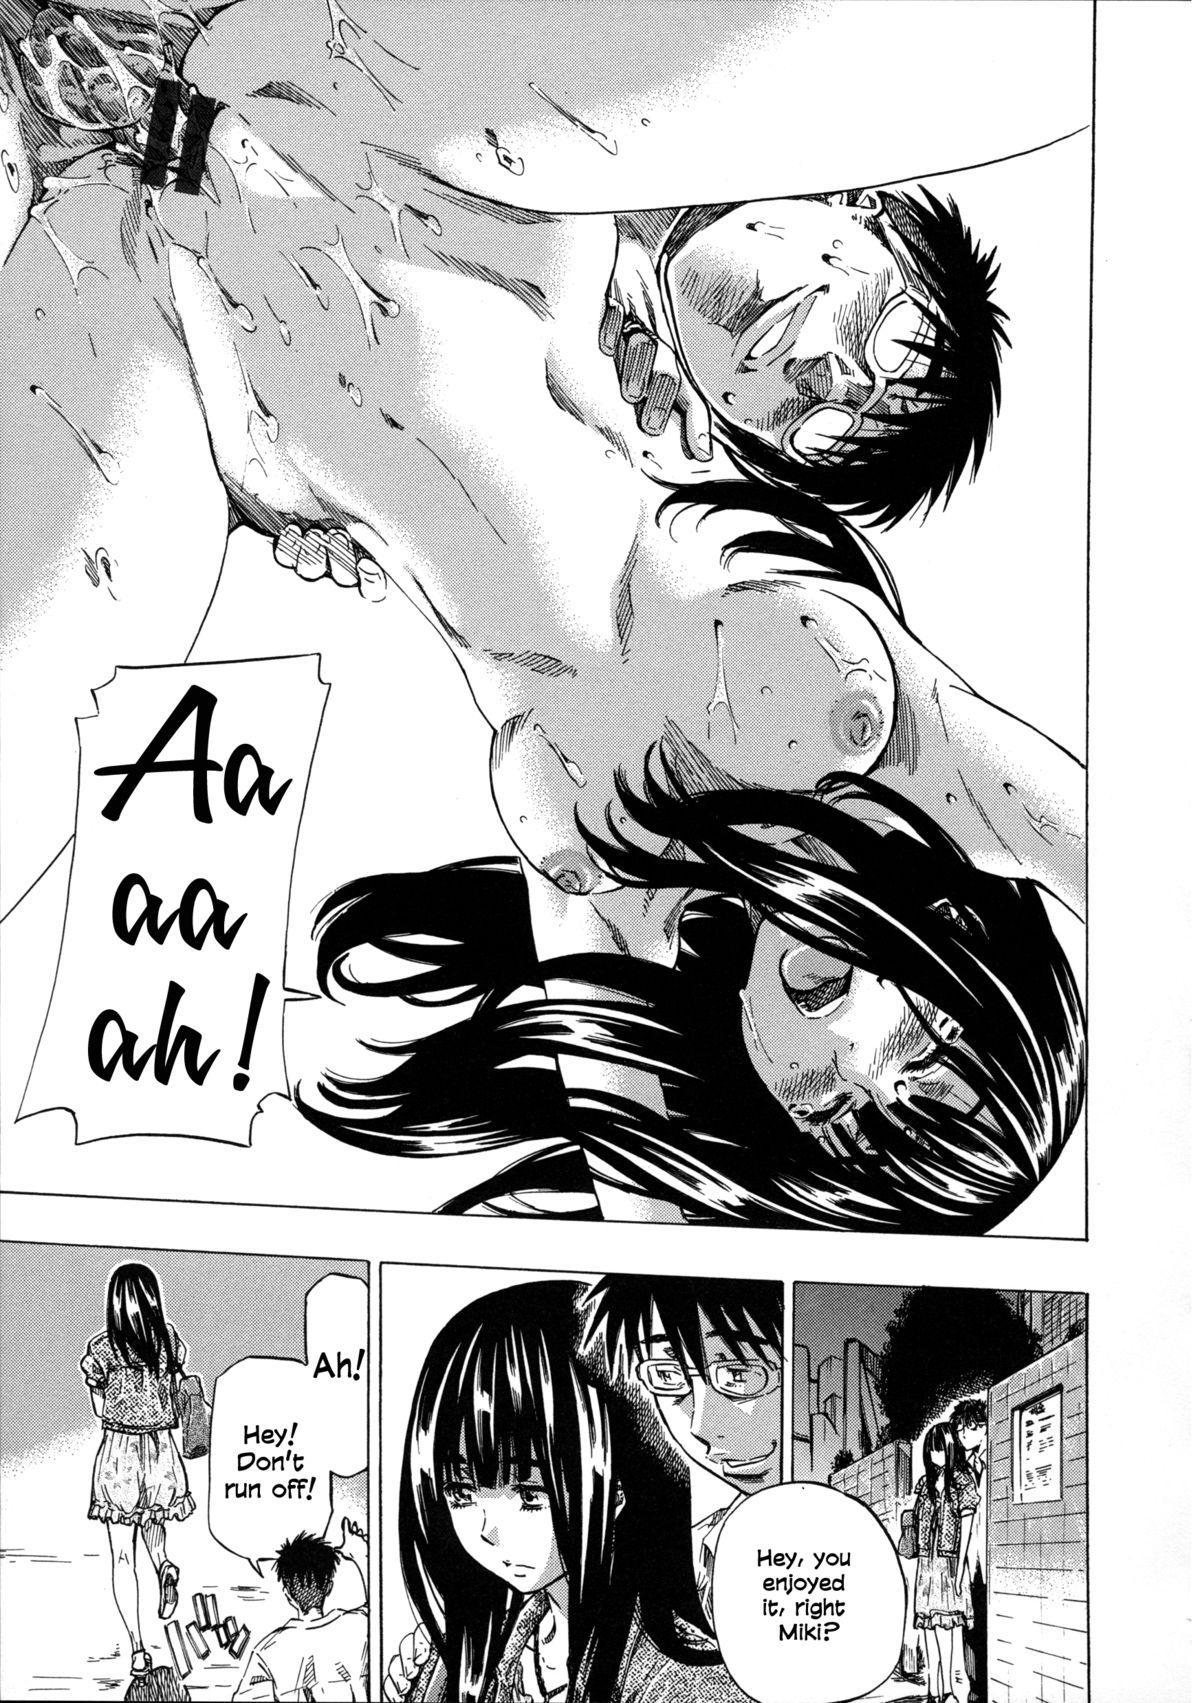 Kashiwazaki Miki wa Ironna Basho de Zenra Sanpo Shitemita | Miki Kashiwazaki Goes Naked in All Sorts of Places 87